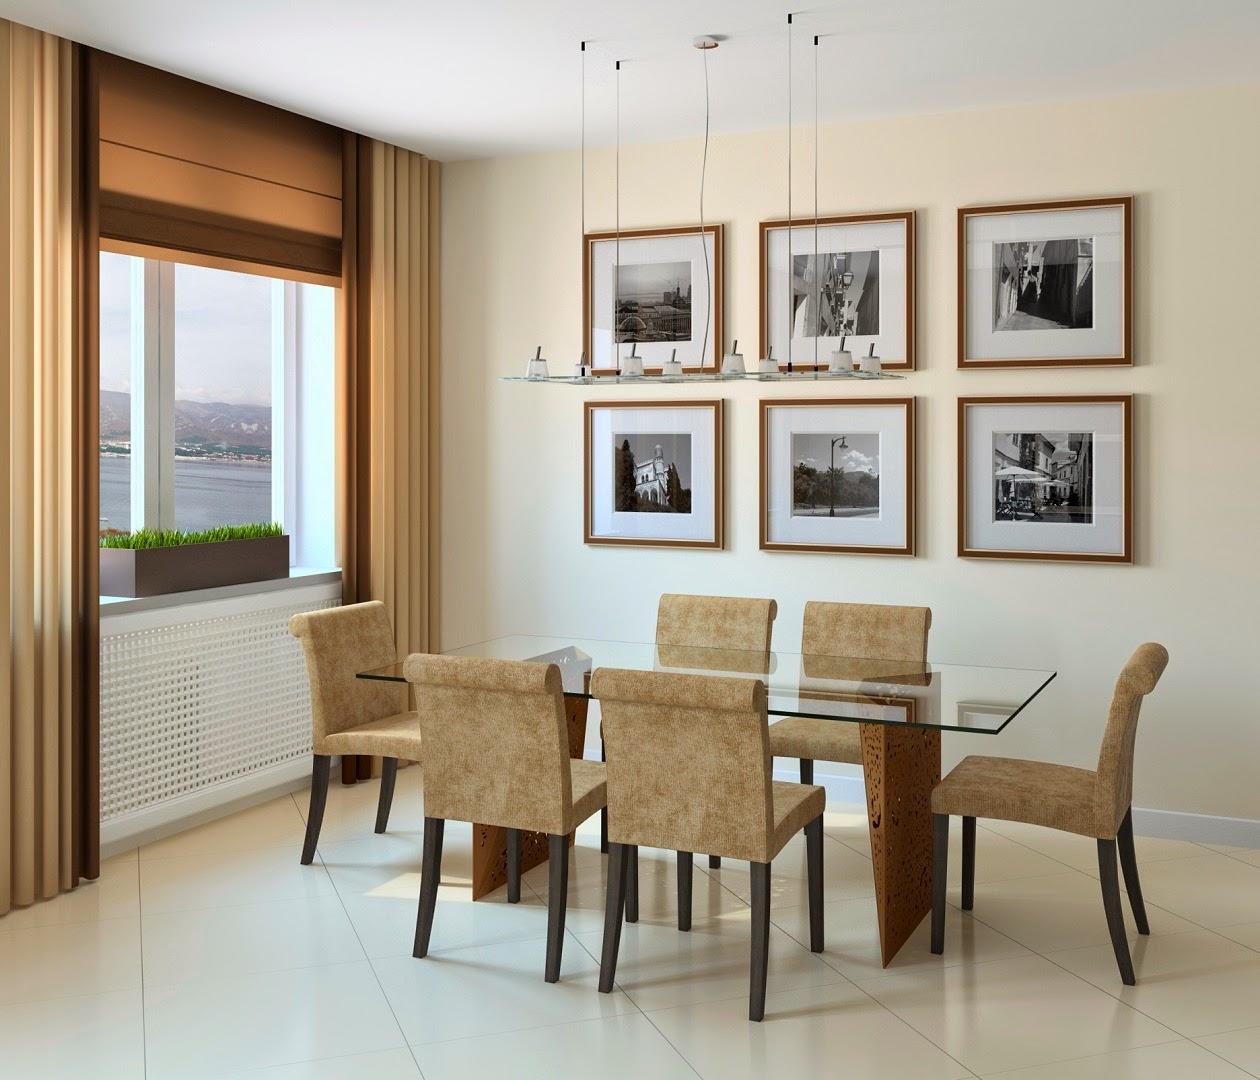 warna cat ruangan makan: Ruang makan minimalis terbaru info cara dan tutorial